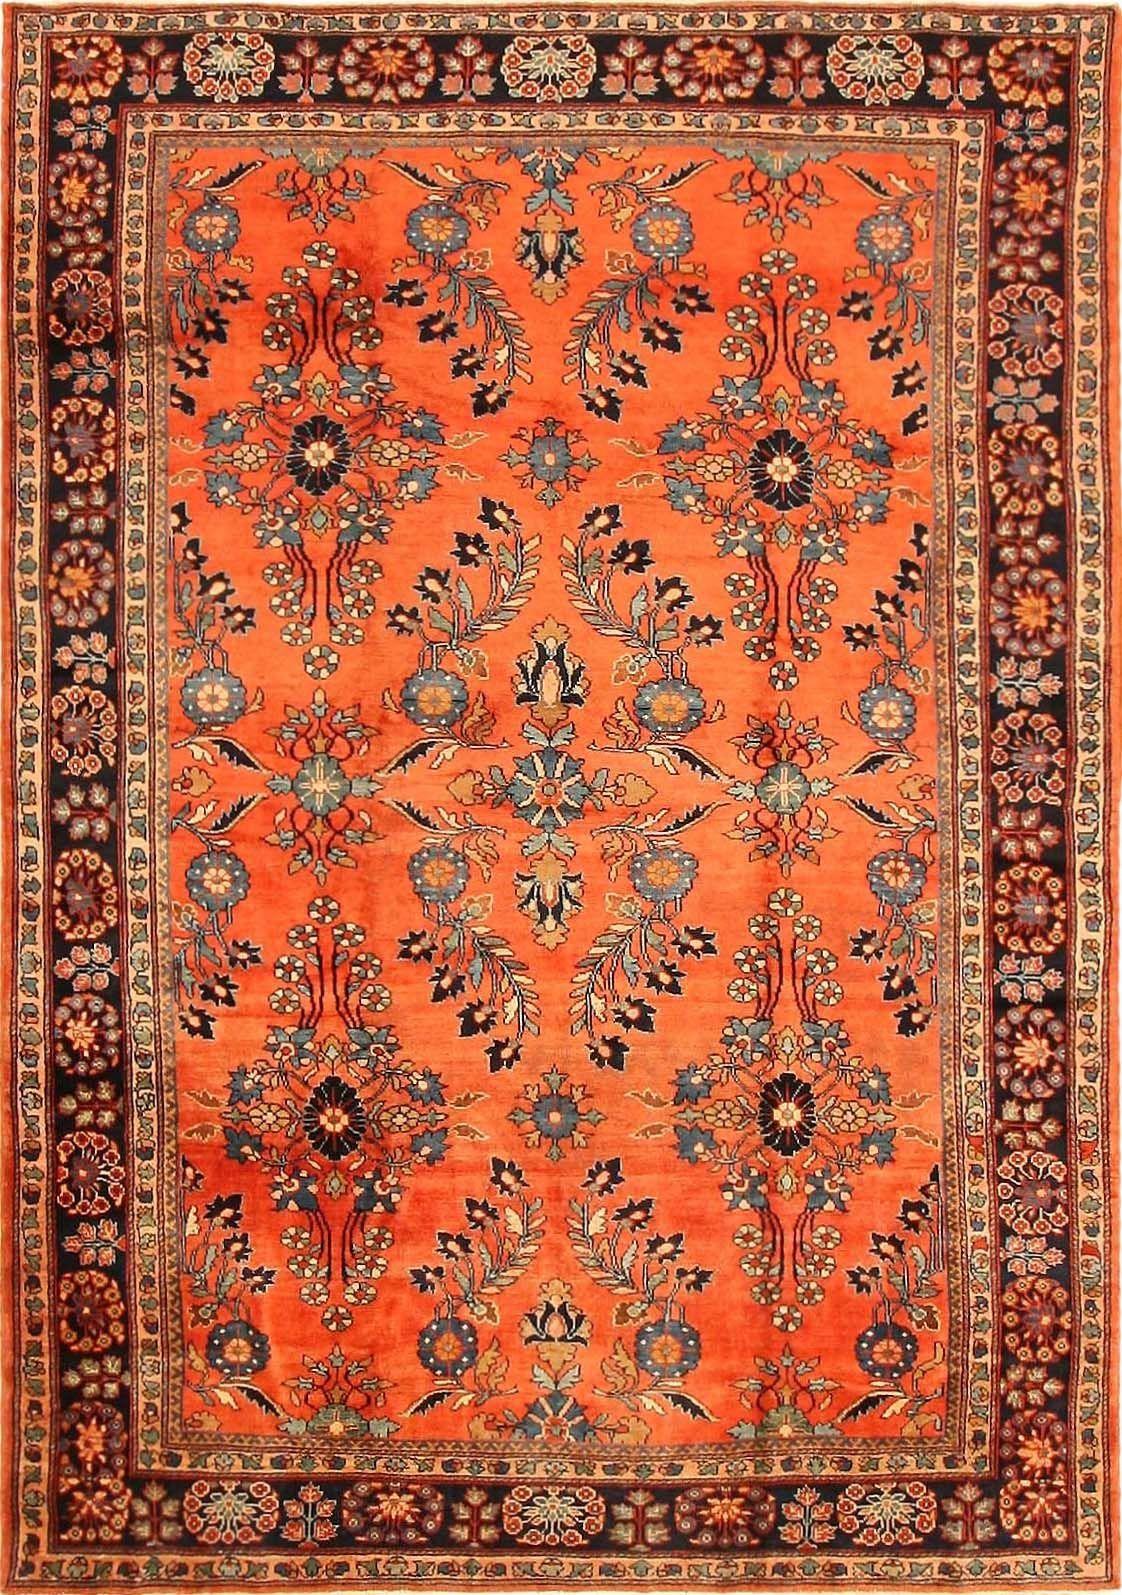 Antique Sultanabad Persian Rug 43227 Tappeti antichi